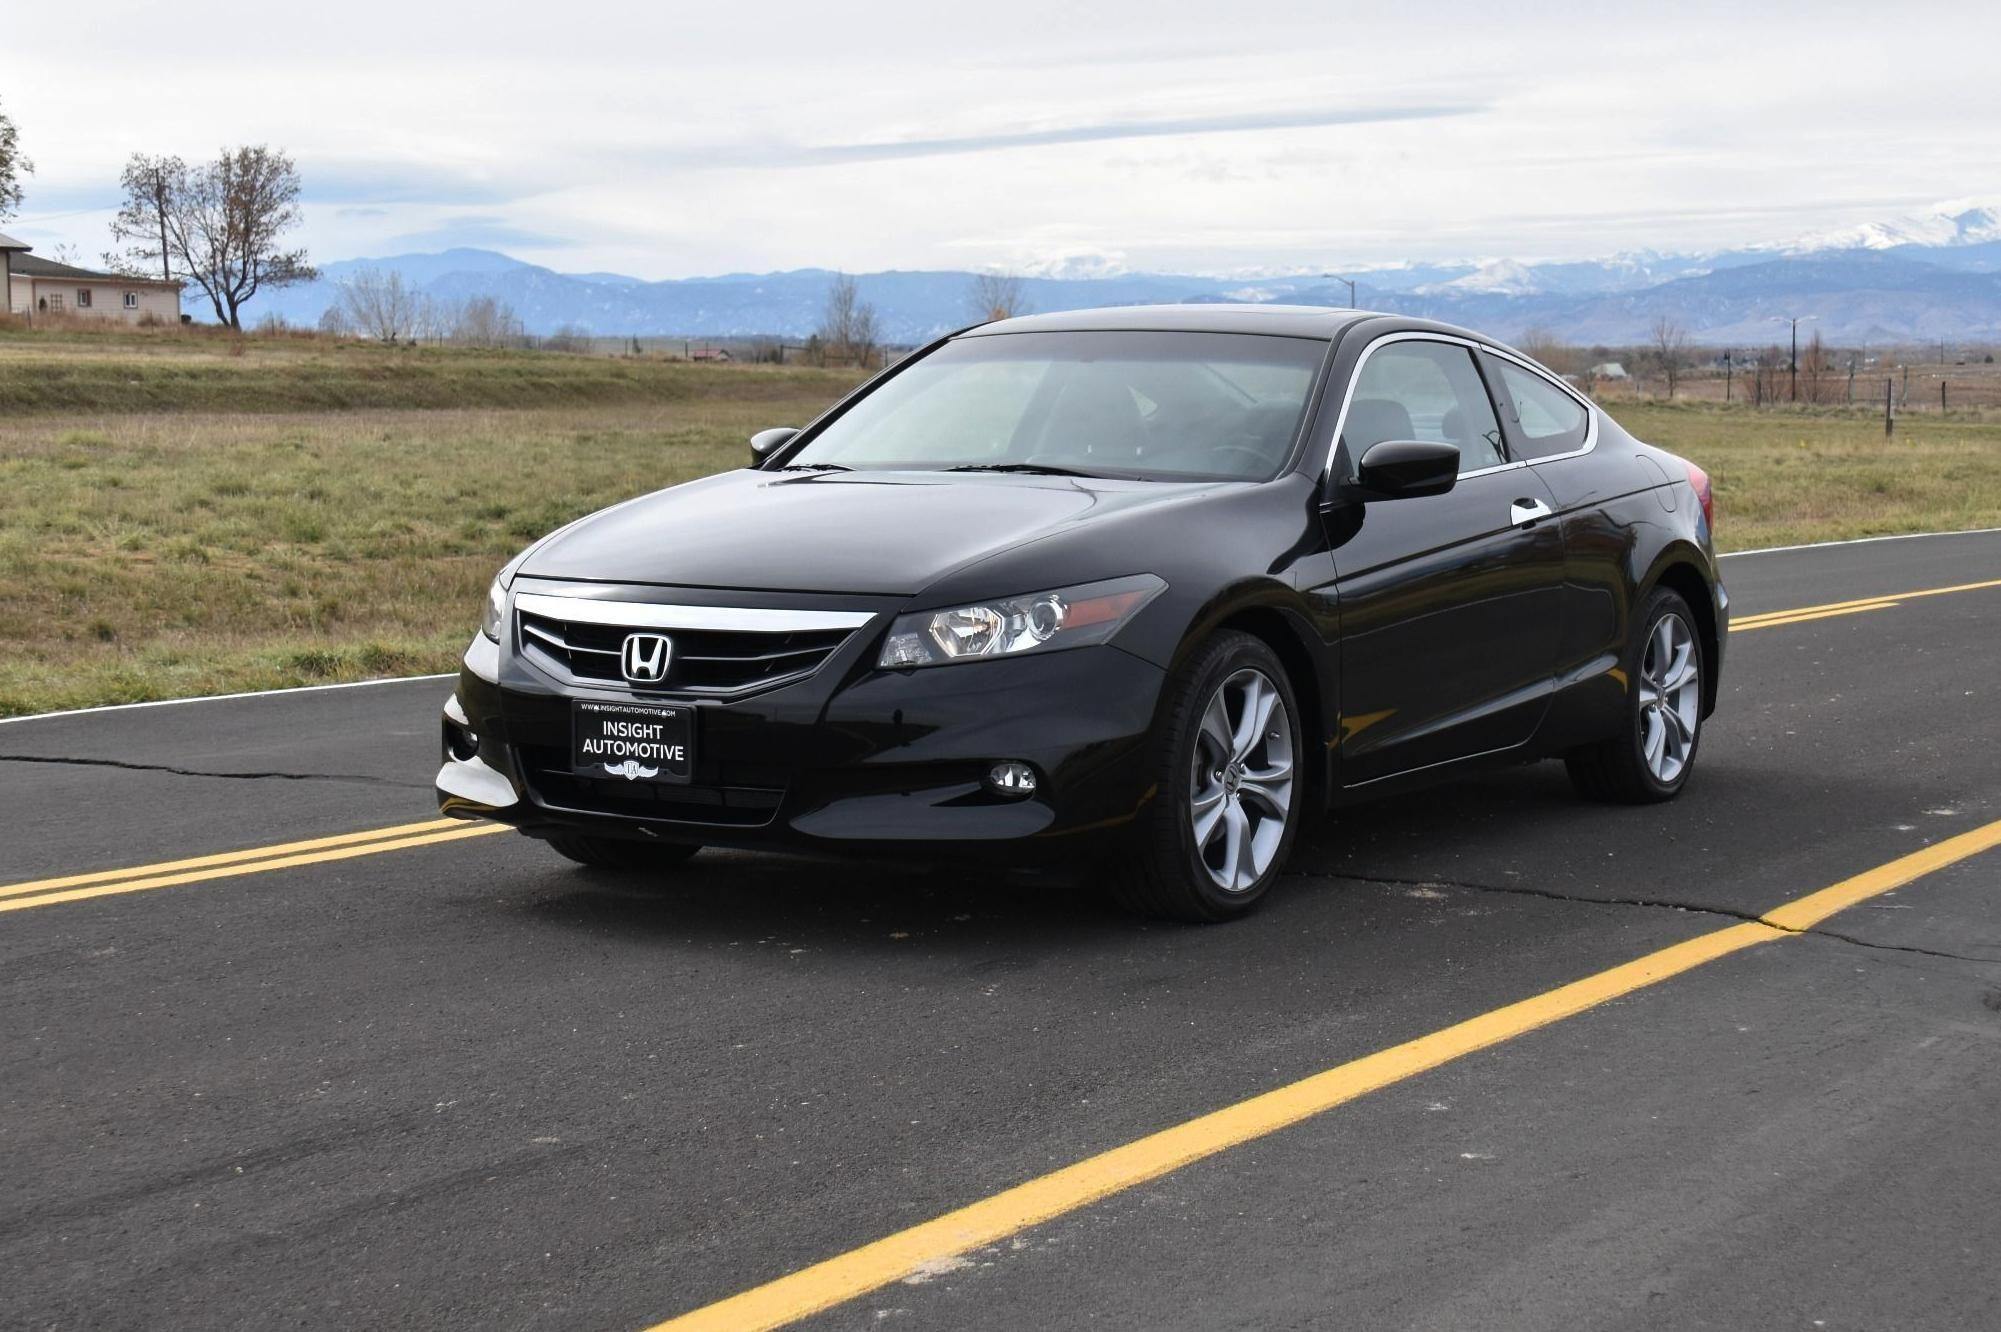 0D%2FWT%2FOC%2FL4L4VWXMWJPKFGHG Interesting Info About 2013 Honda Accord Exl with Terrific Pictures Cars Review